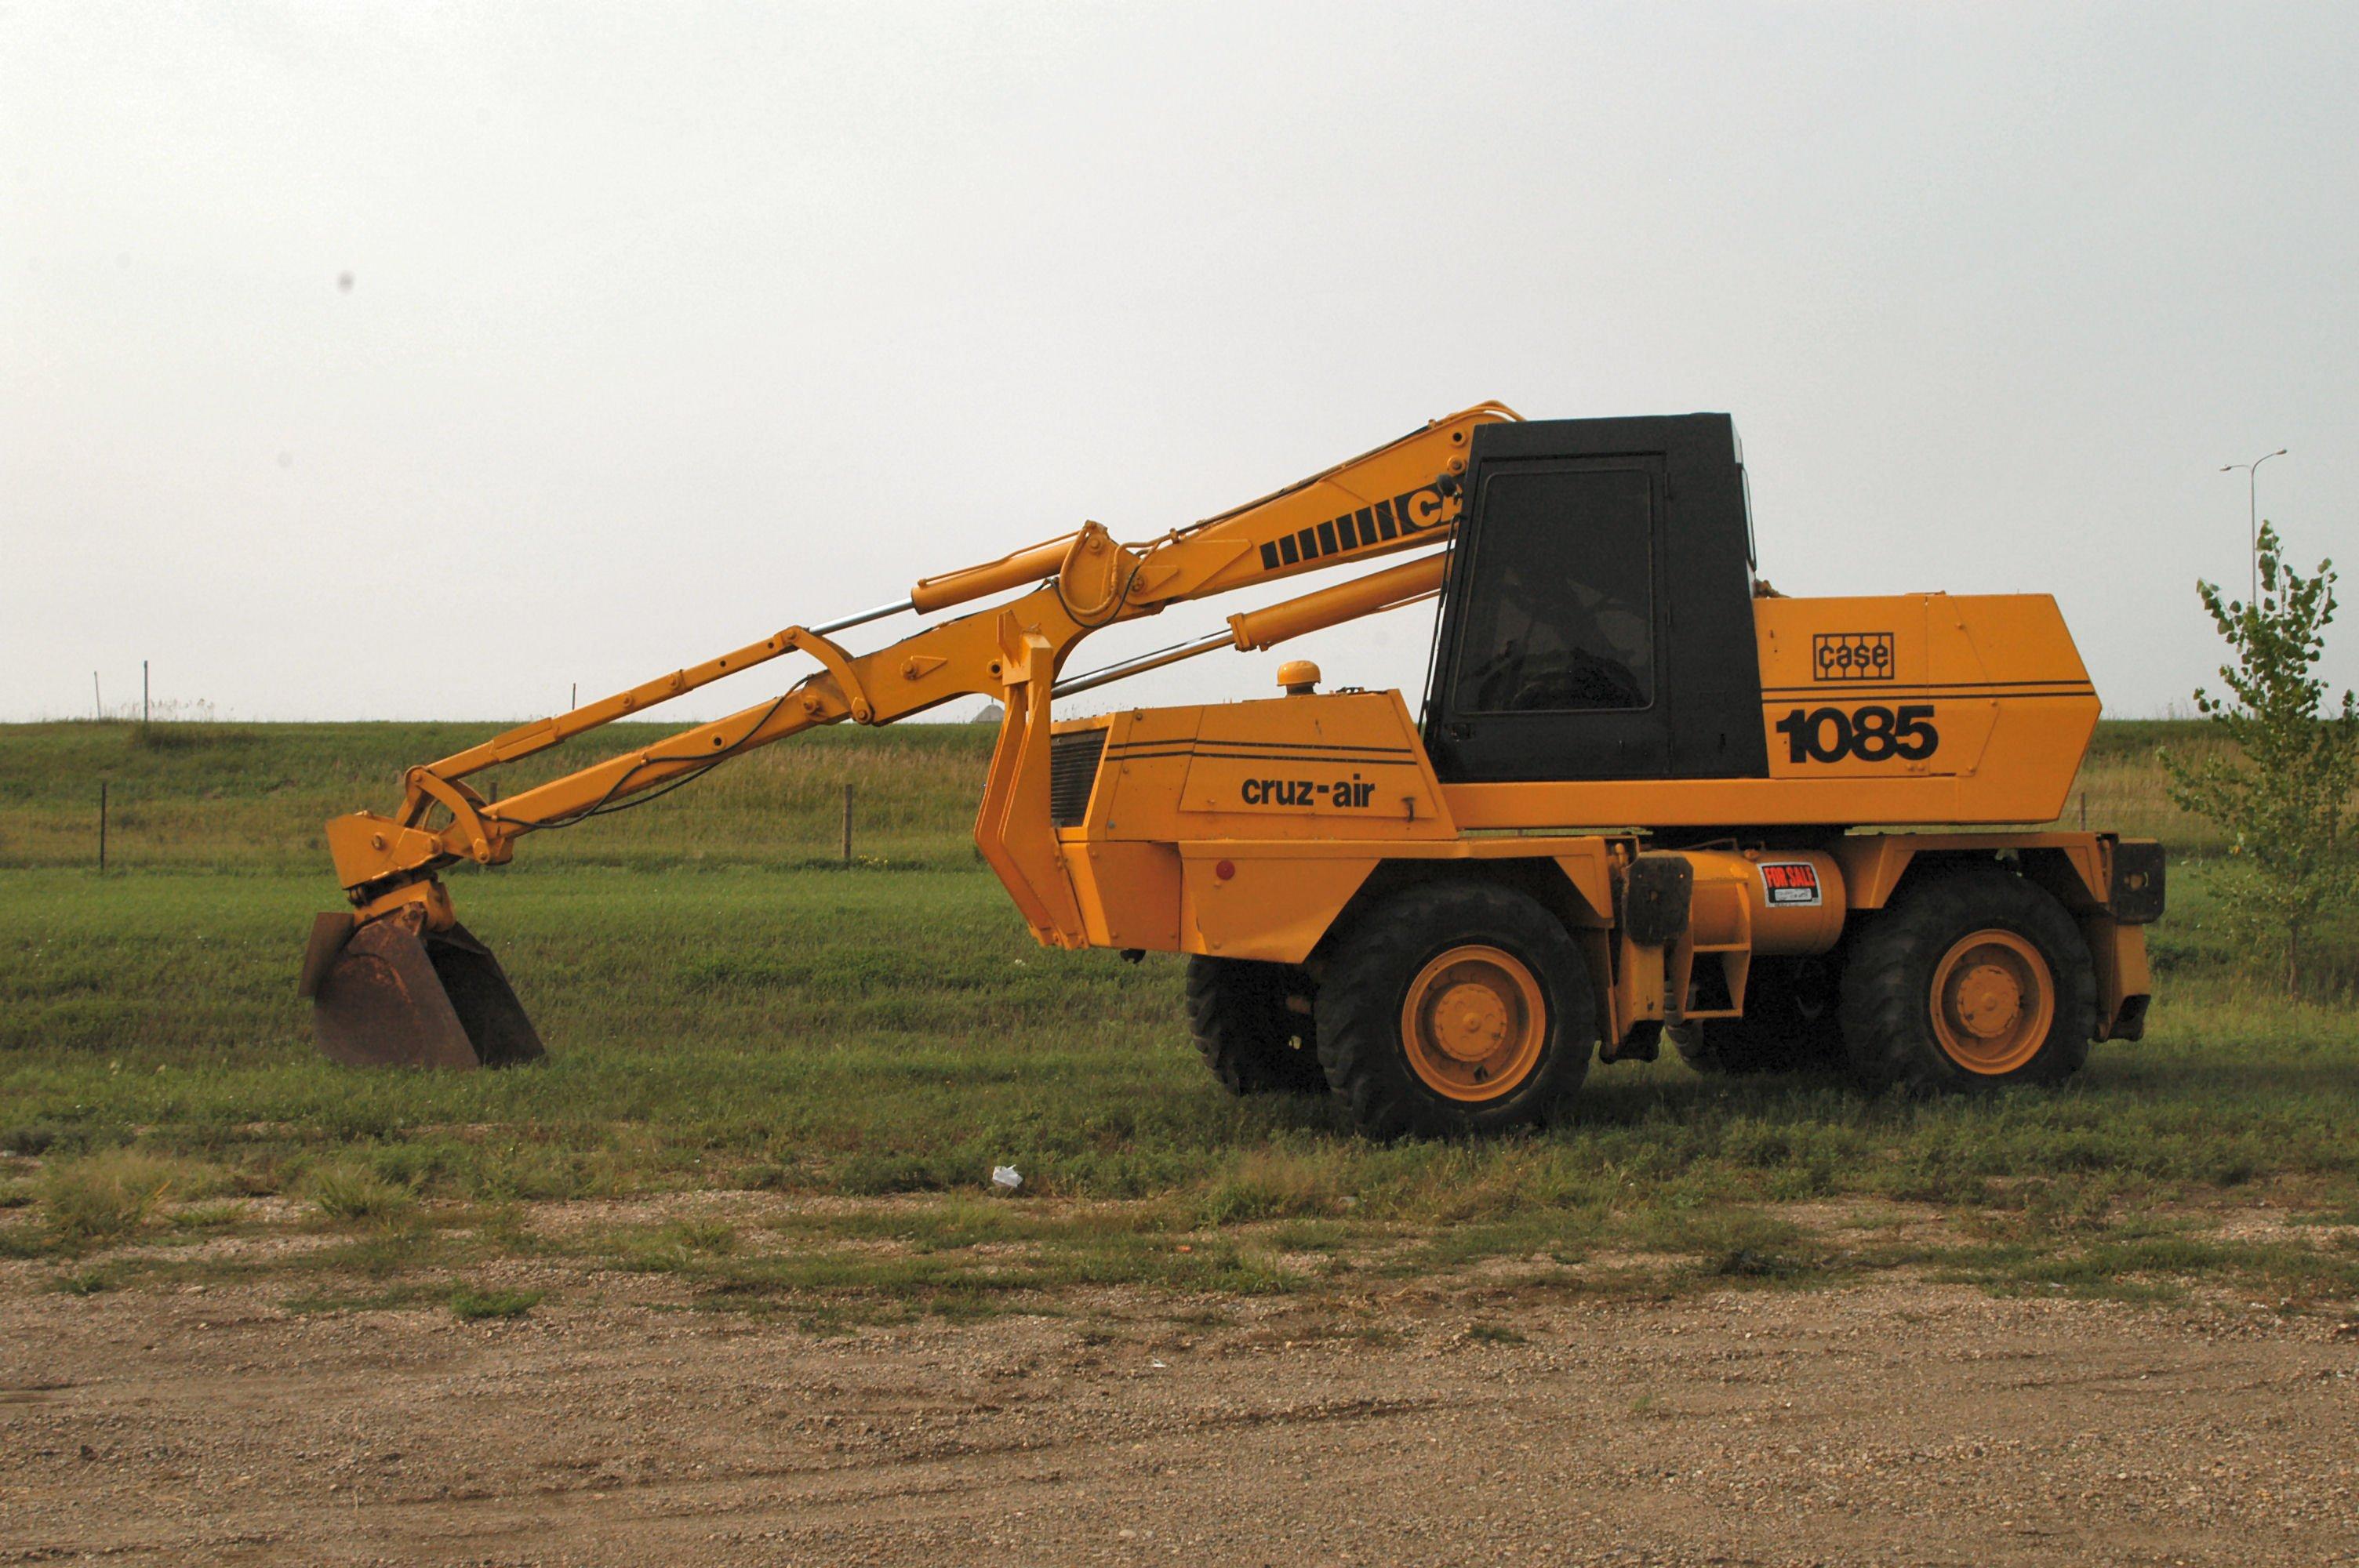 cruz air  escavatore gommato case drott Case_1085_cruz_air_02_of_57